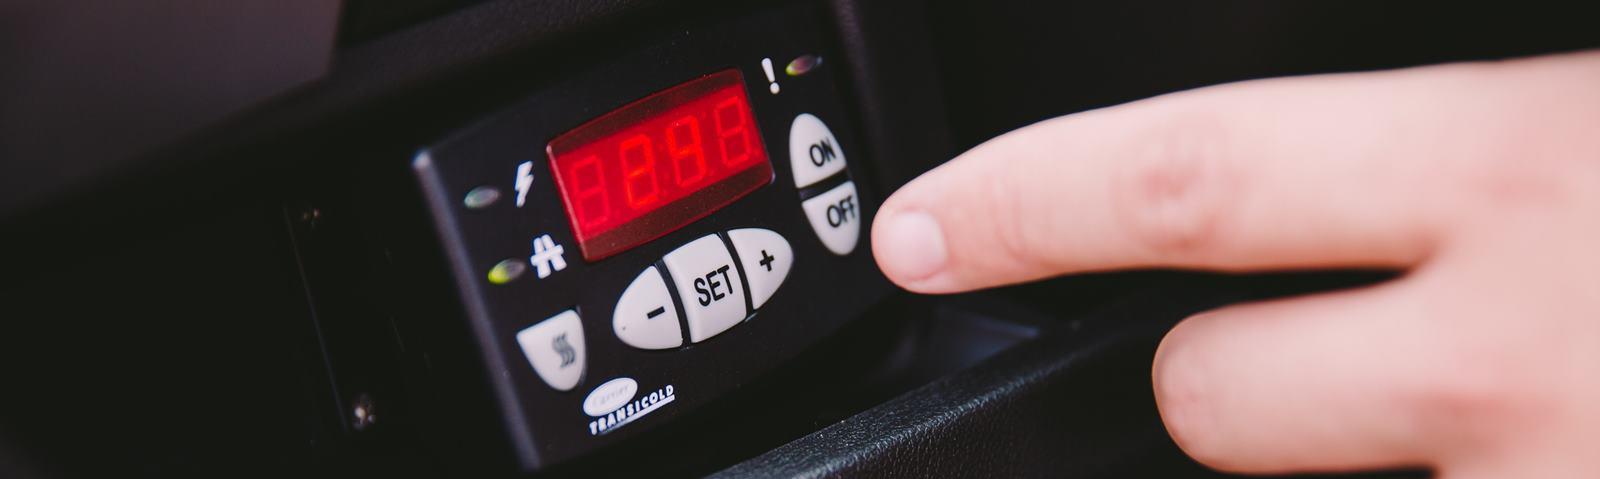 autotherm-hutoauto-kapcsolat-slide